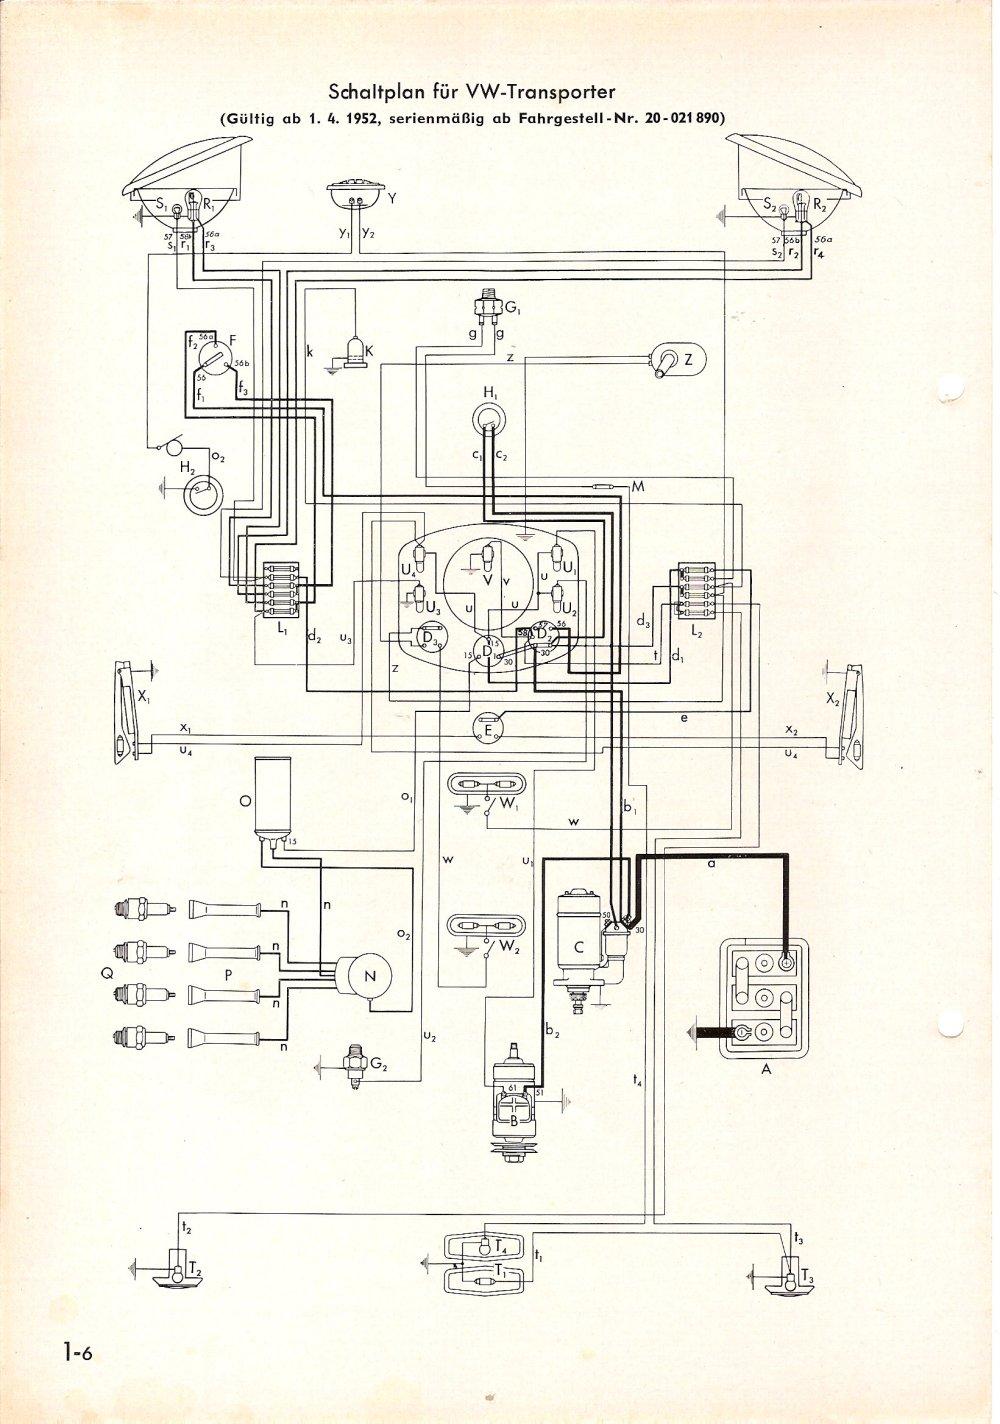 medium resolution of 1952 chevy styleline fleetline wiring diagram 1952 chevy chevy truck wiring diagram chevrolet tail light wiring diagram